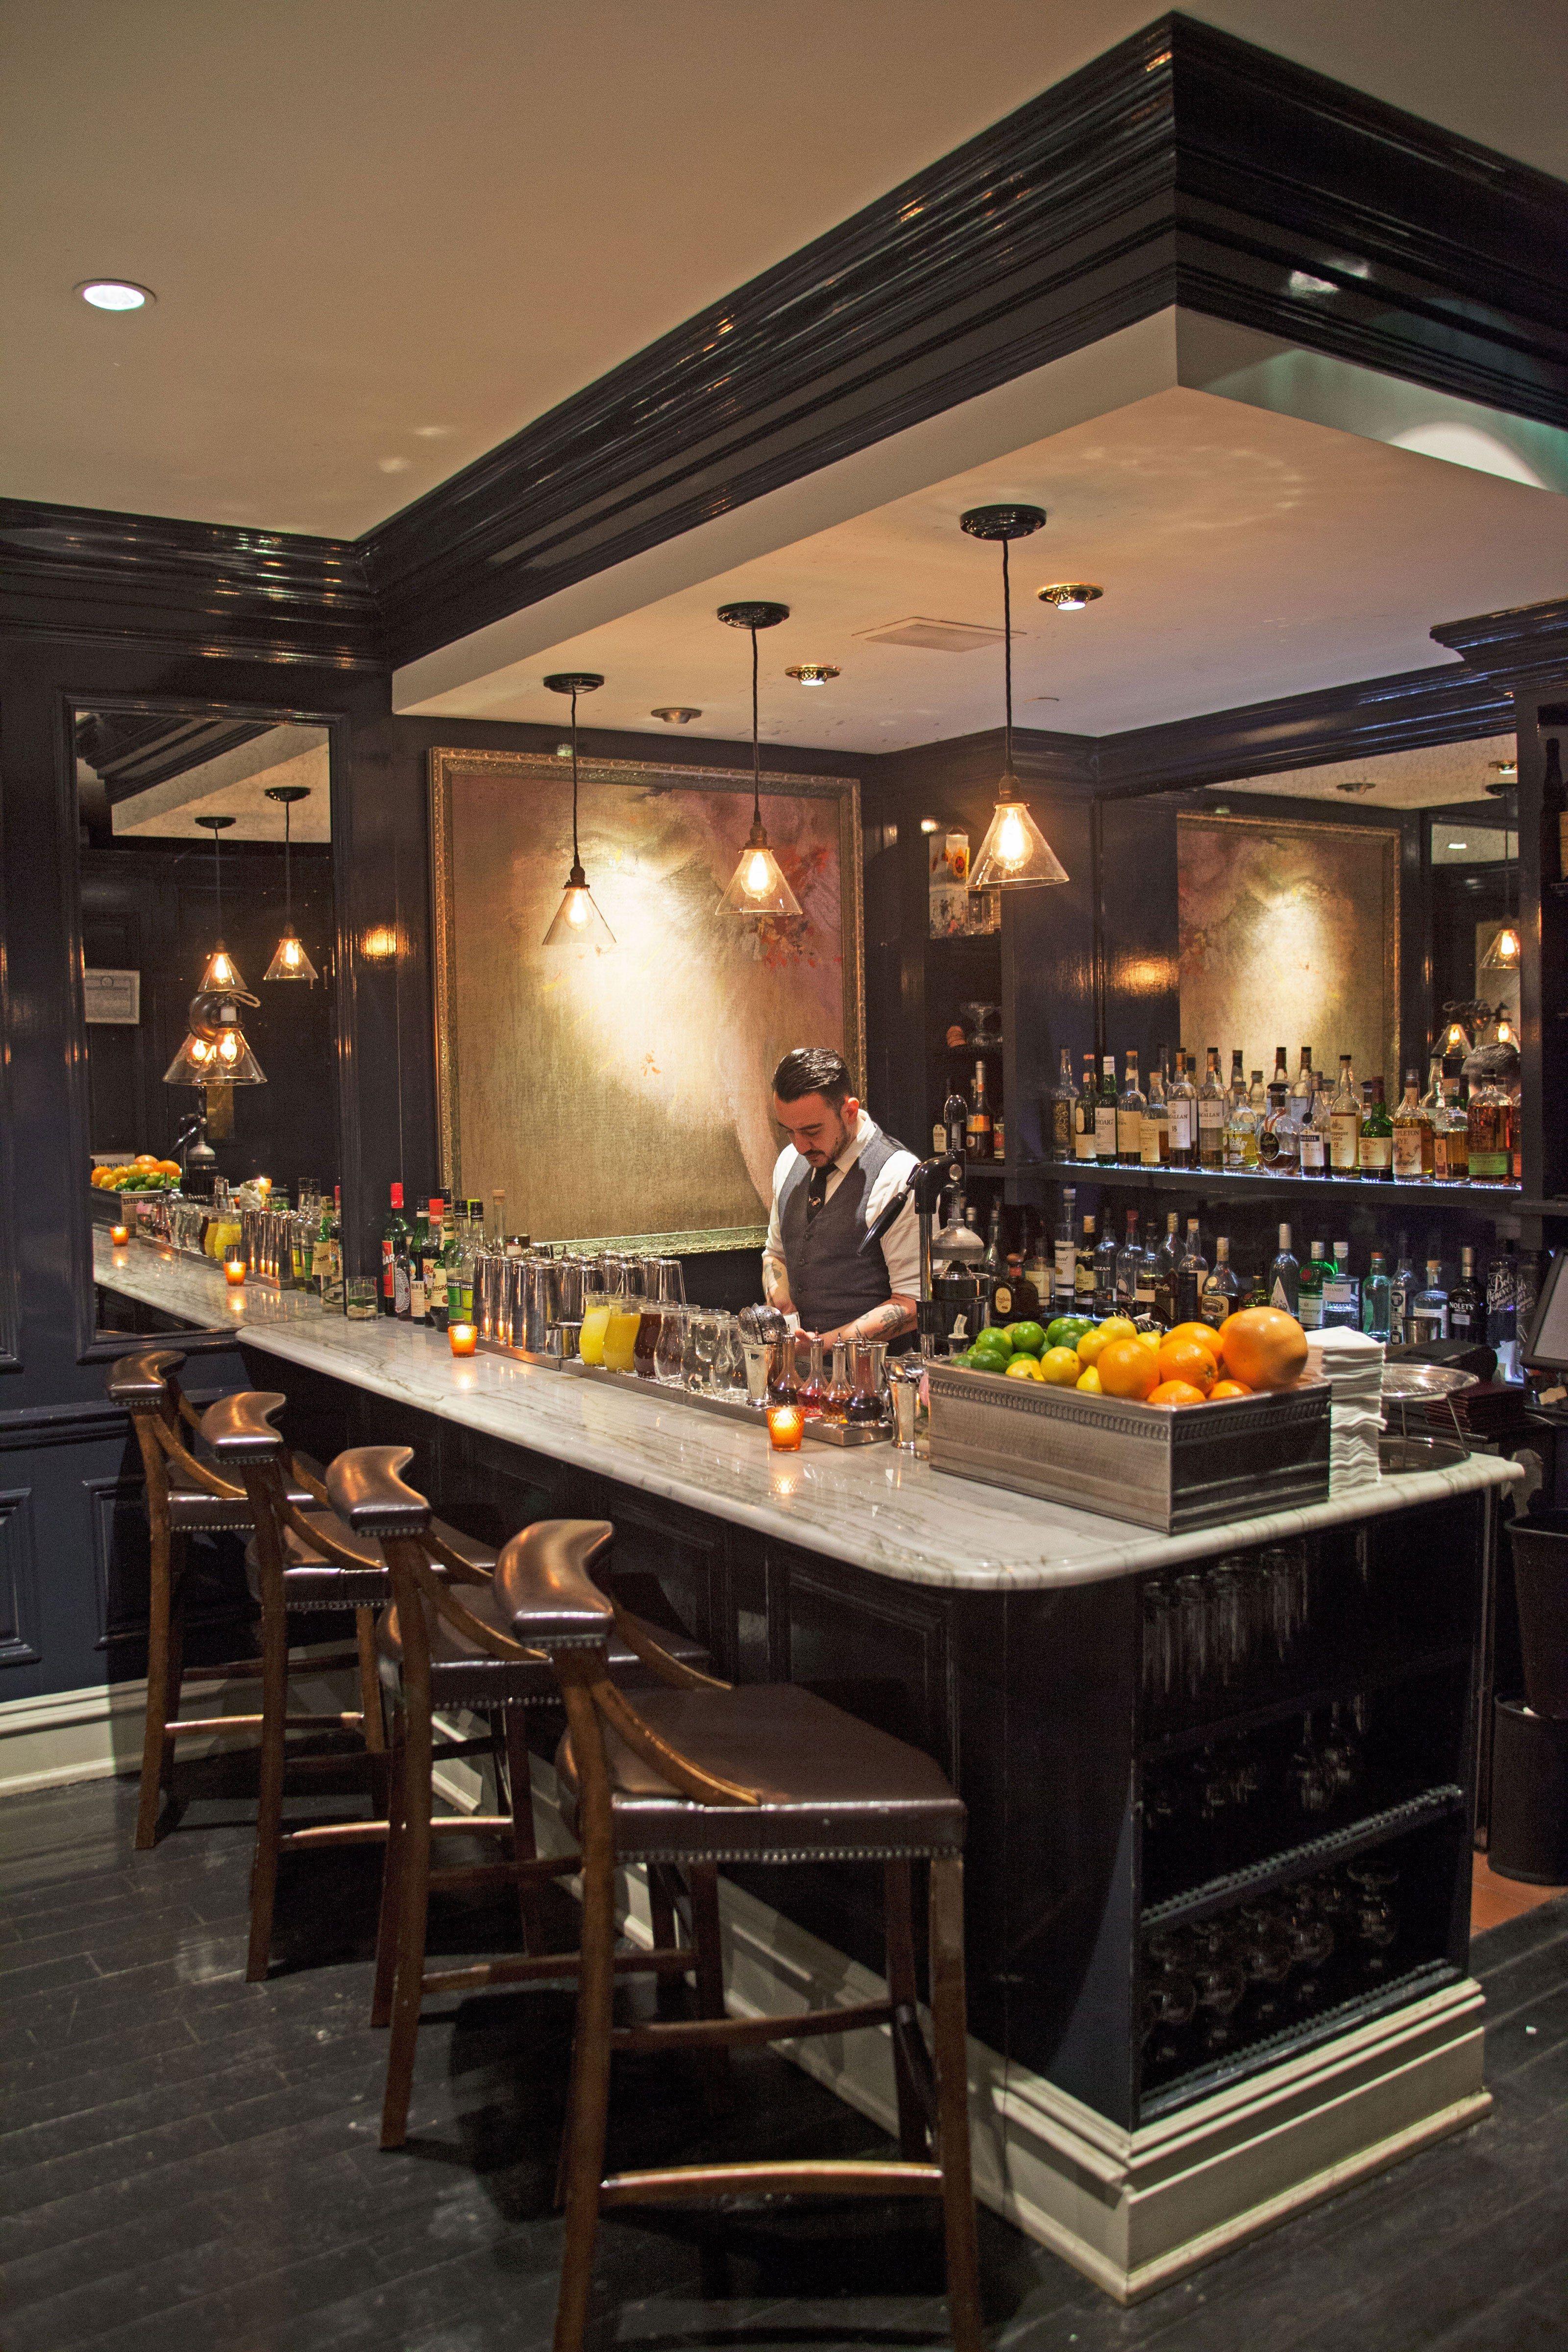 peek inside new york city s most stylish hidden bars restaurant bar speakeasy bar bar lounge. Black Bedroom Furniture Sets. Home Design Ideas